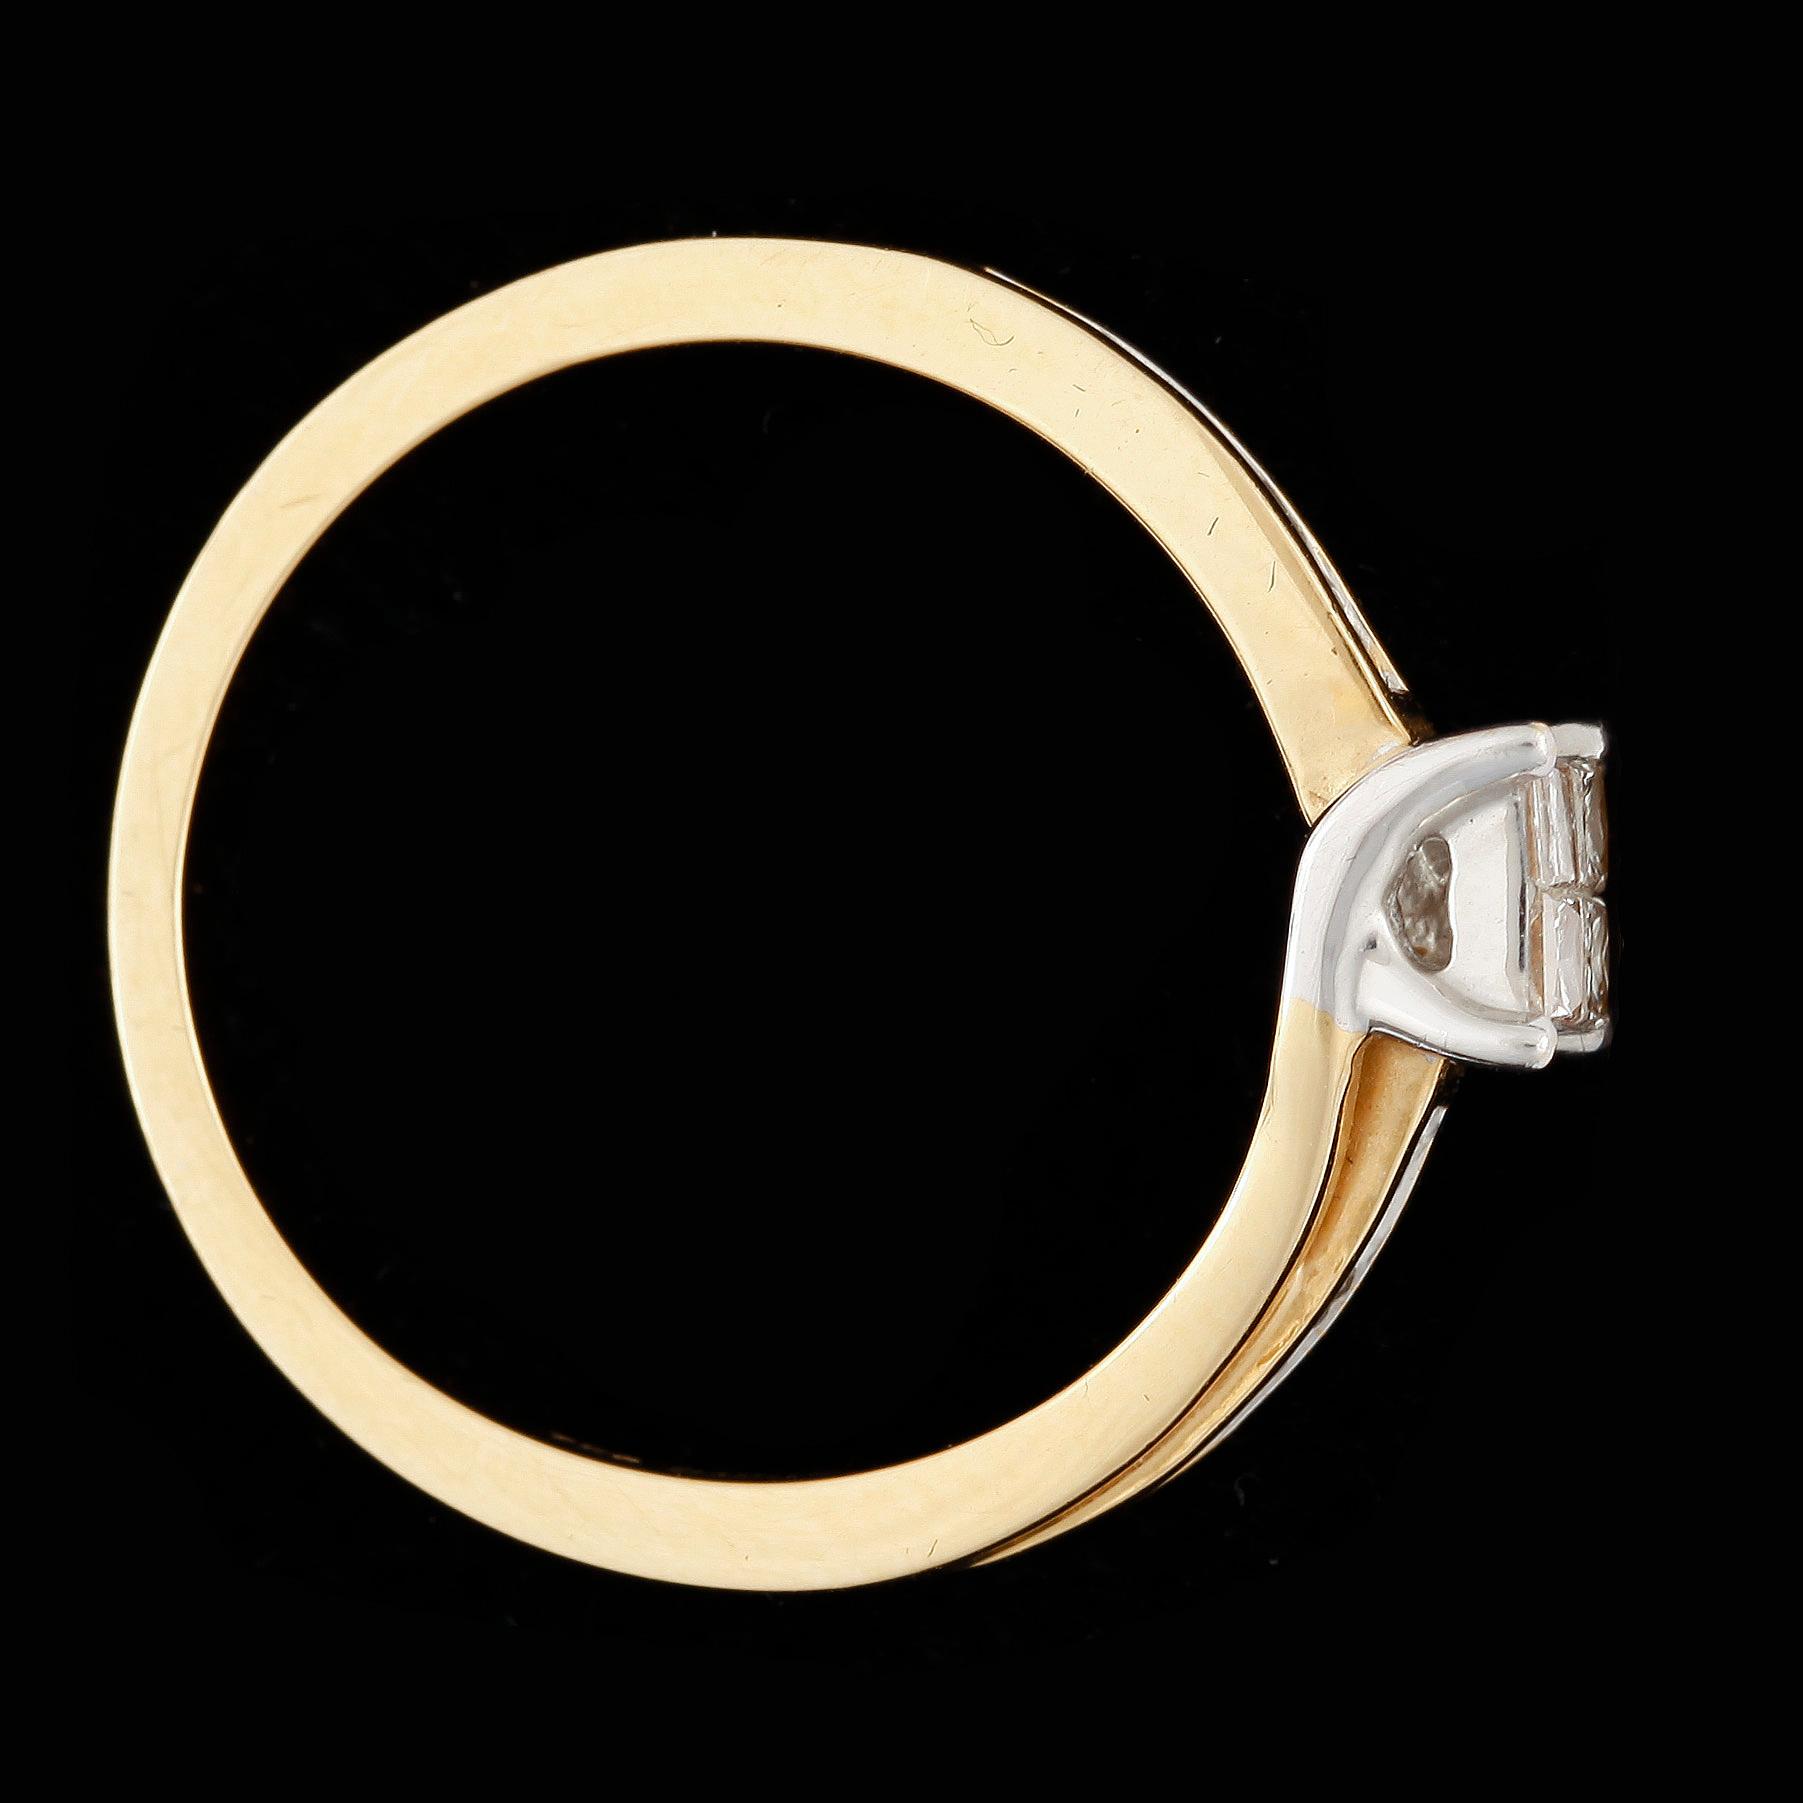 0ef30705f735 RING, 18k guld, små prinsesslipade diamanter, Guldfynd, Hallbergs Guld/Albrekts  Guld. Vikt ca 3,4g. - Bukowskis